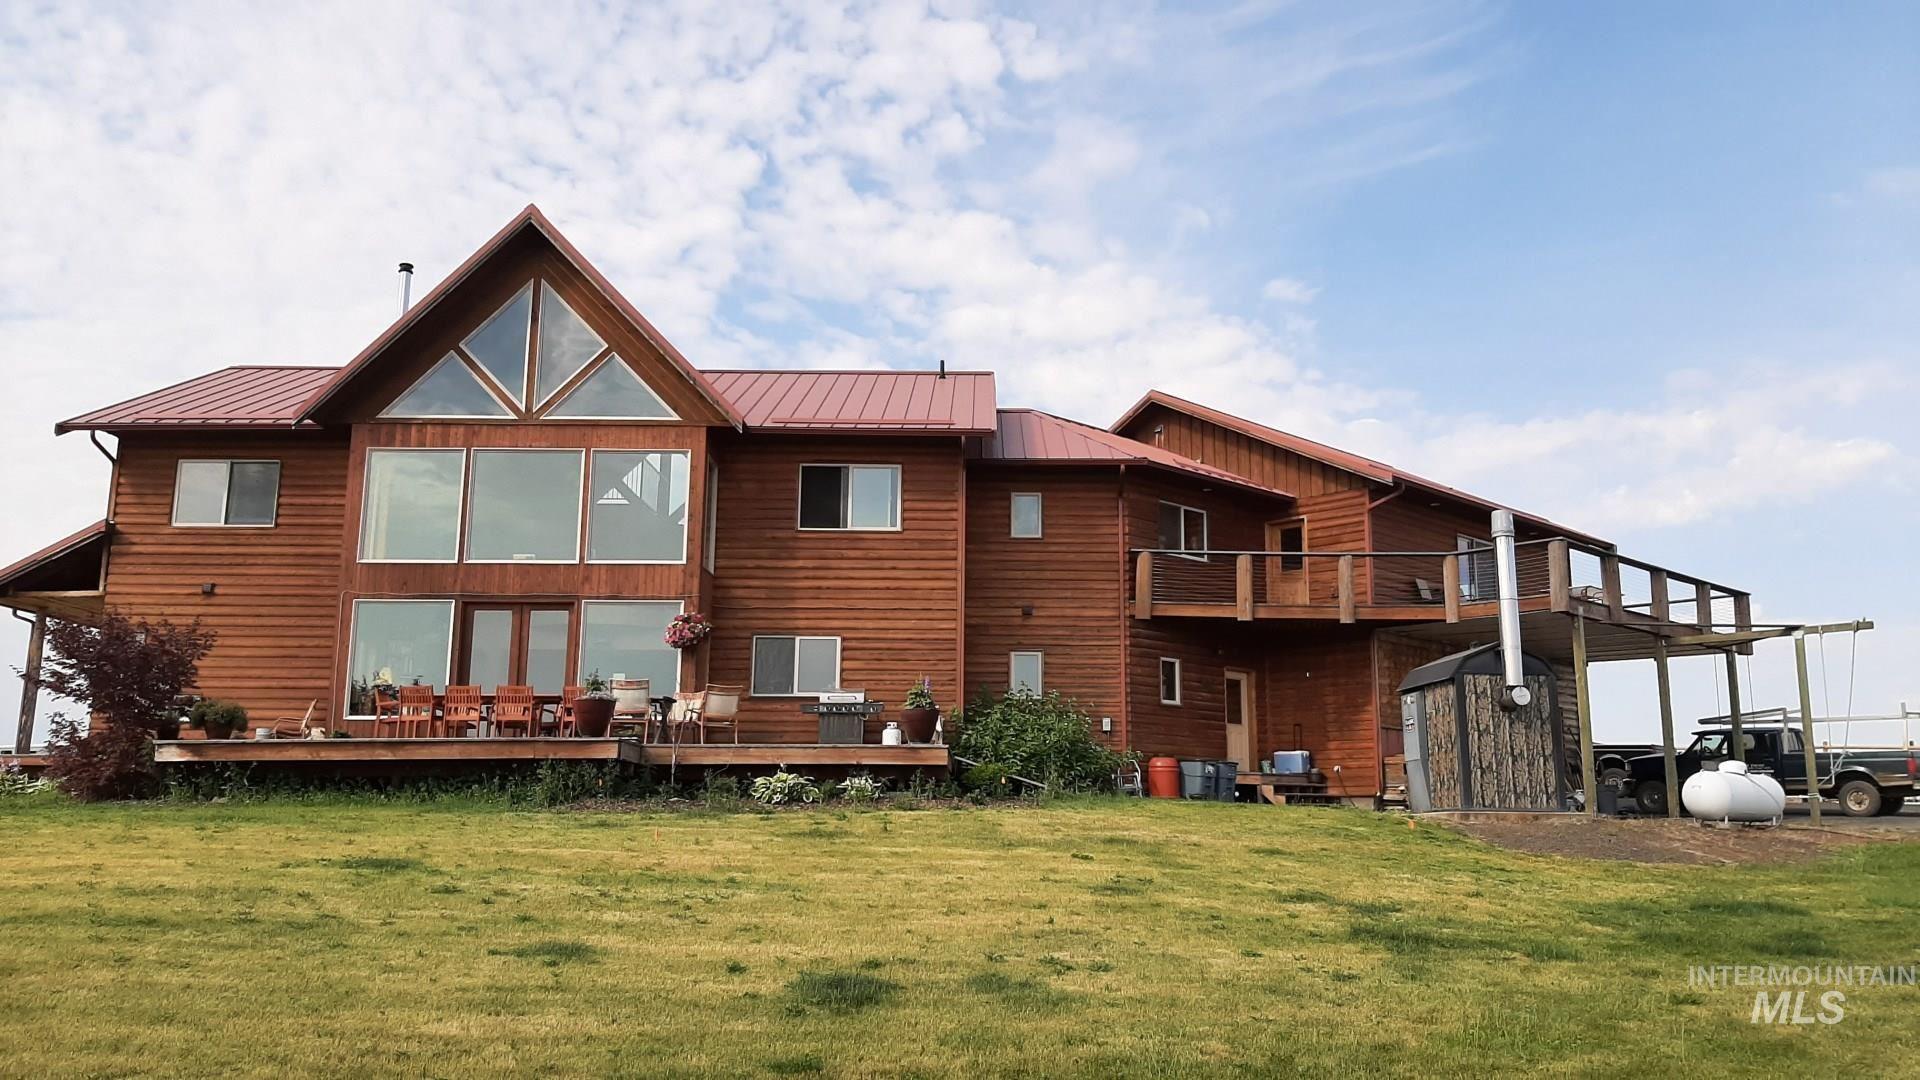 Photo of 149 Mountain View LN, Grangeville, ID 83530 (MLS # 98776617)